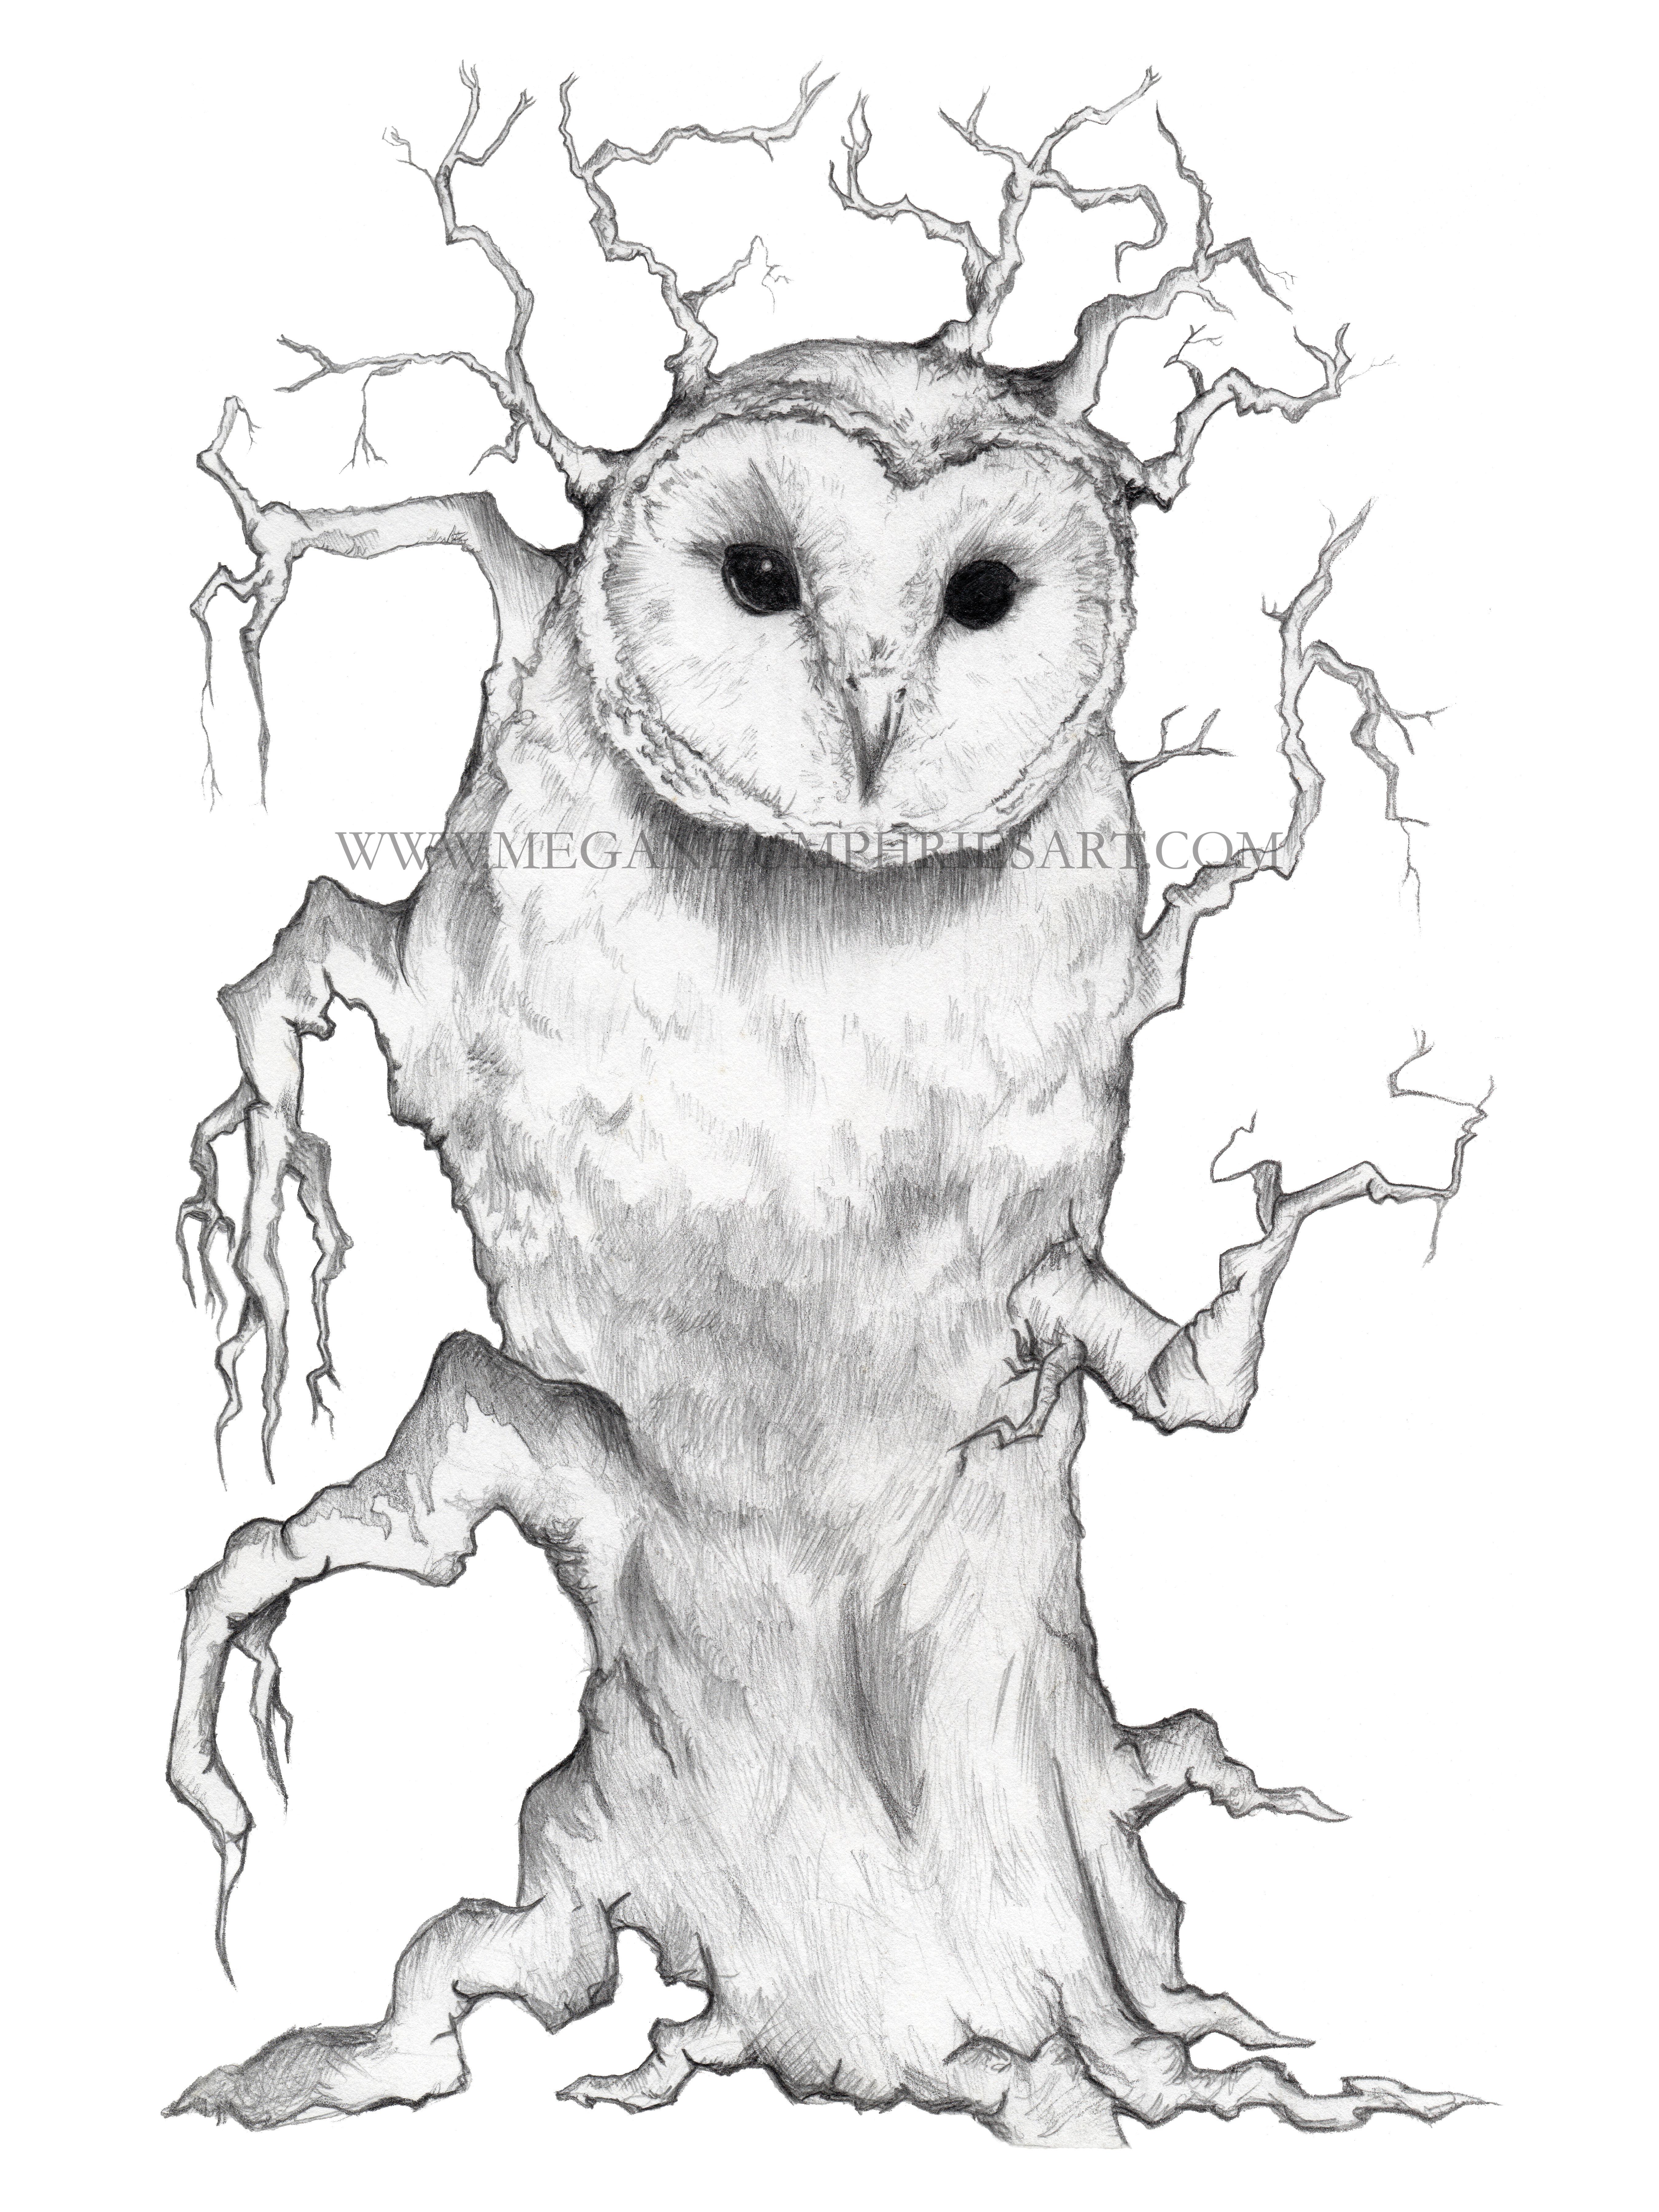 5400x7200 Megan Humphries Art Wildlife Drawings And Paintings